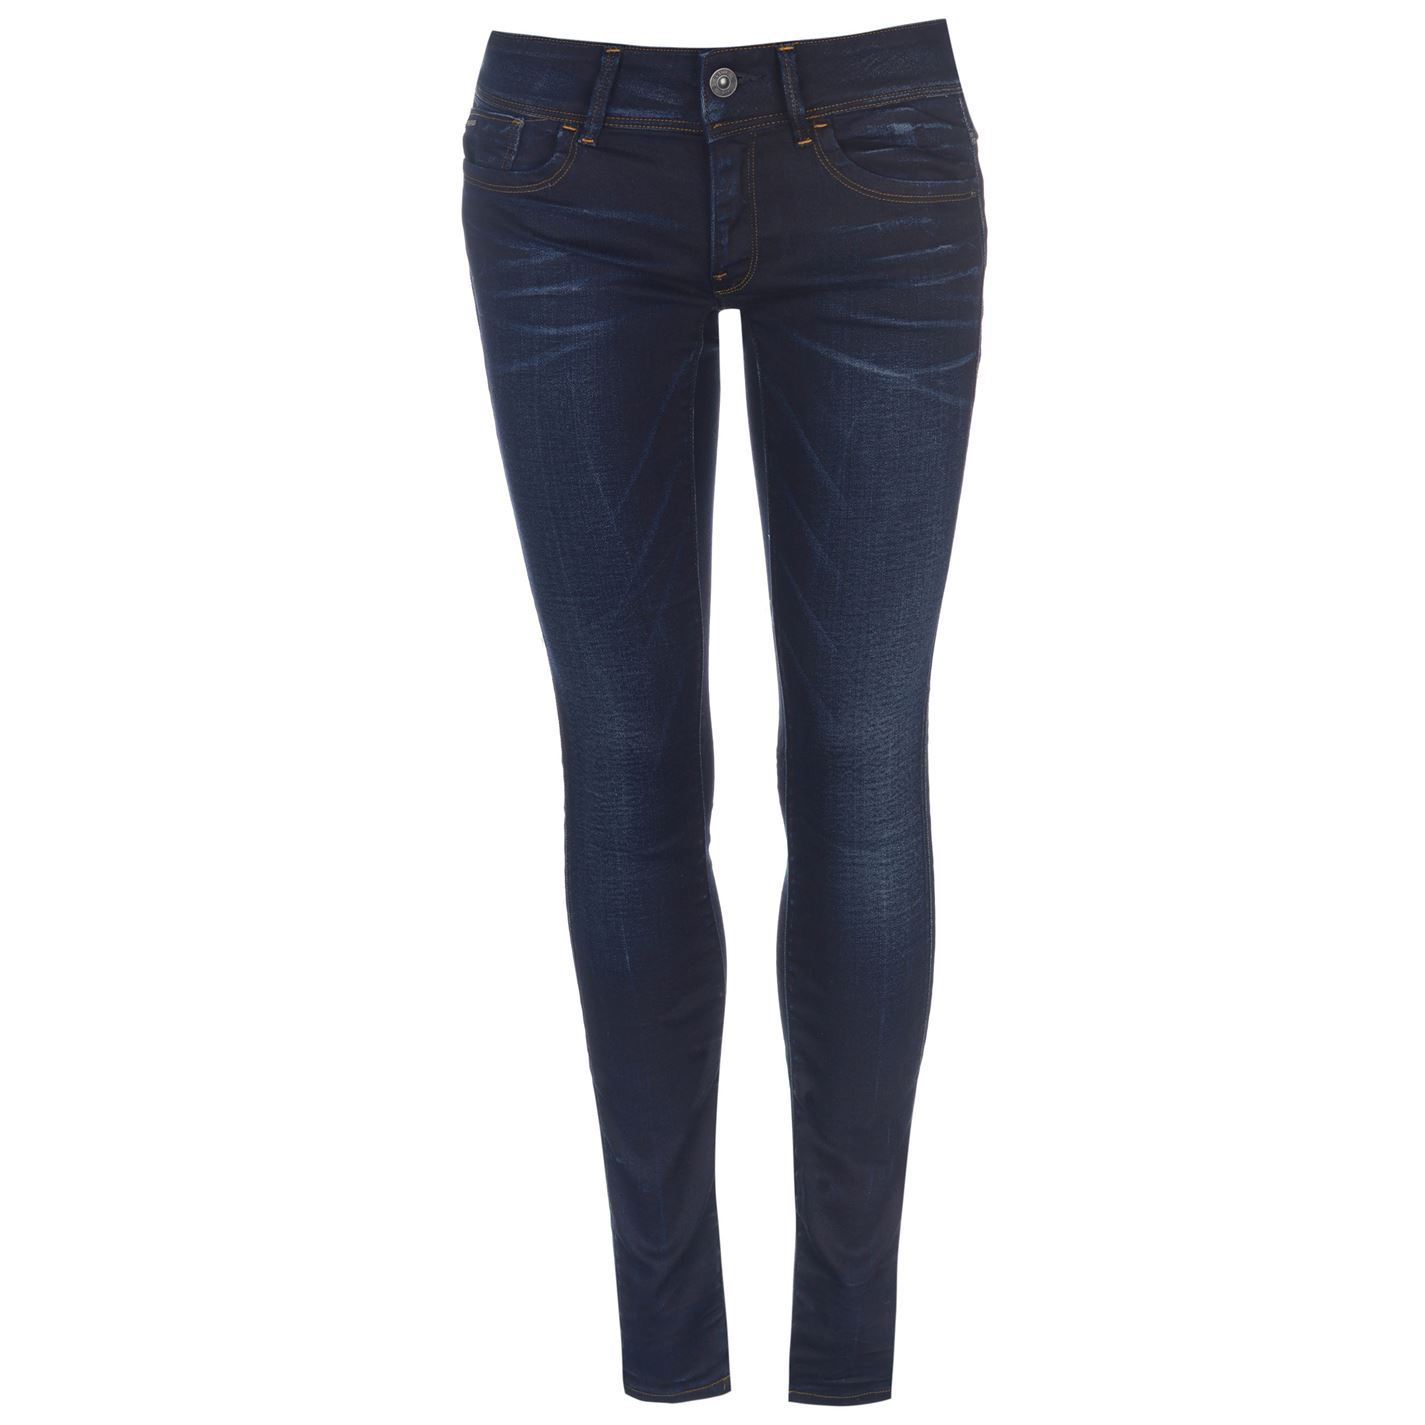 G-Star-Womens-Raw-Lynn-Mid-Waist-Skinny-Jeans-Pants-Trousers-Bottoms-Zip-Fit